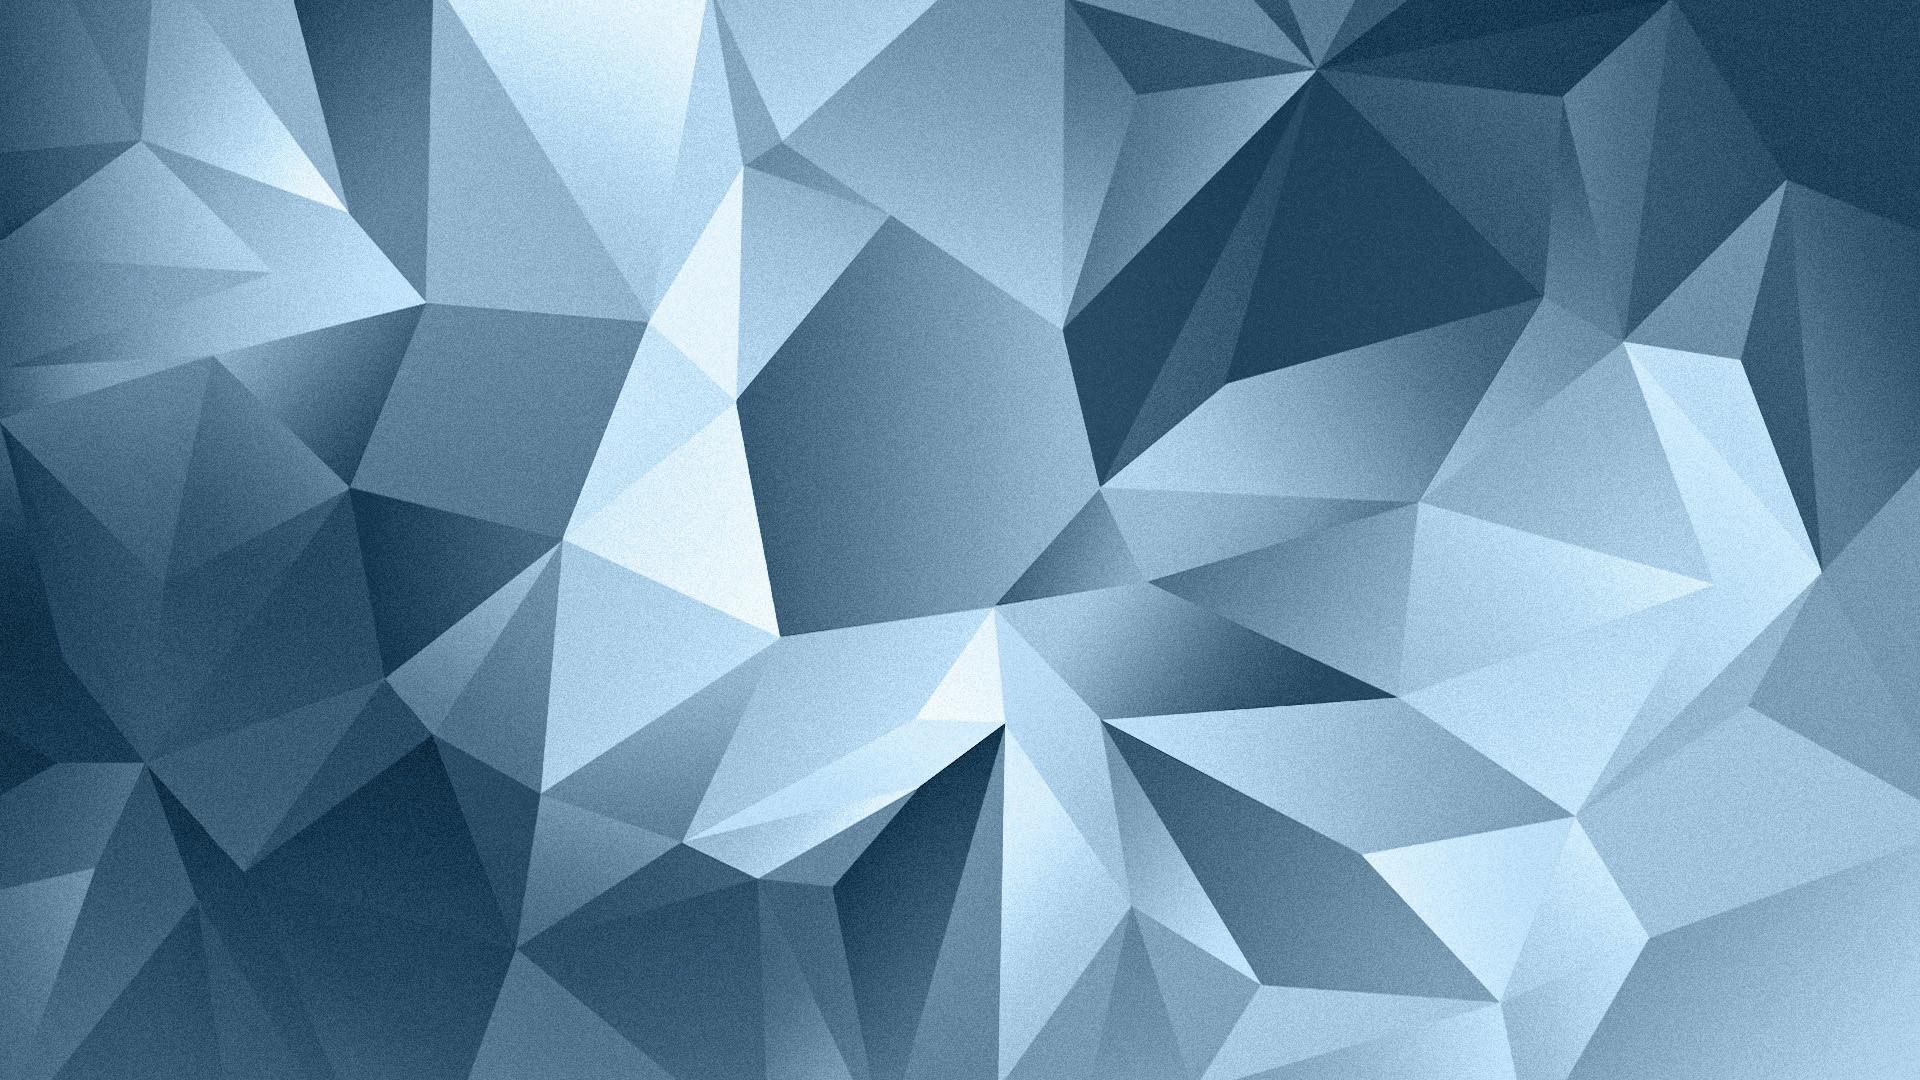 Diamond Shape Wallpaper 56 Images